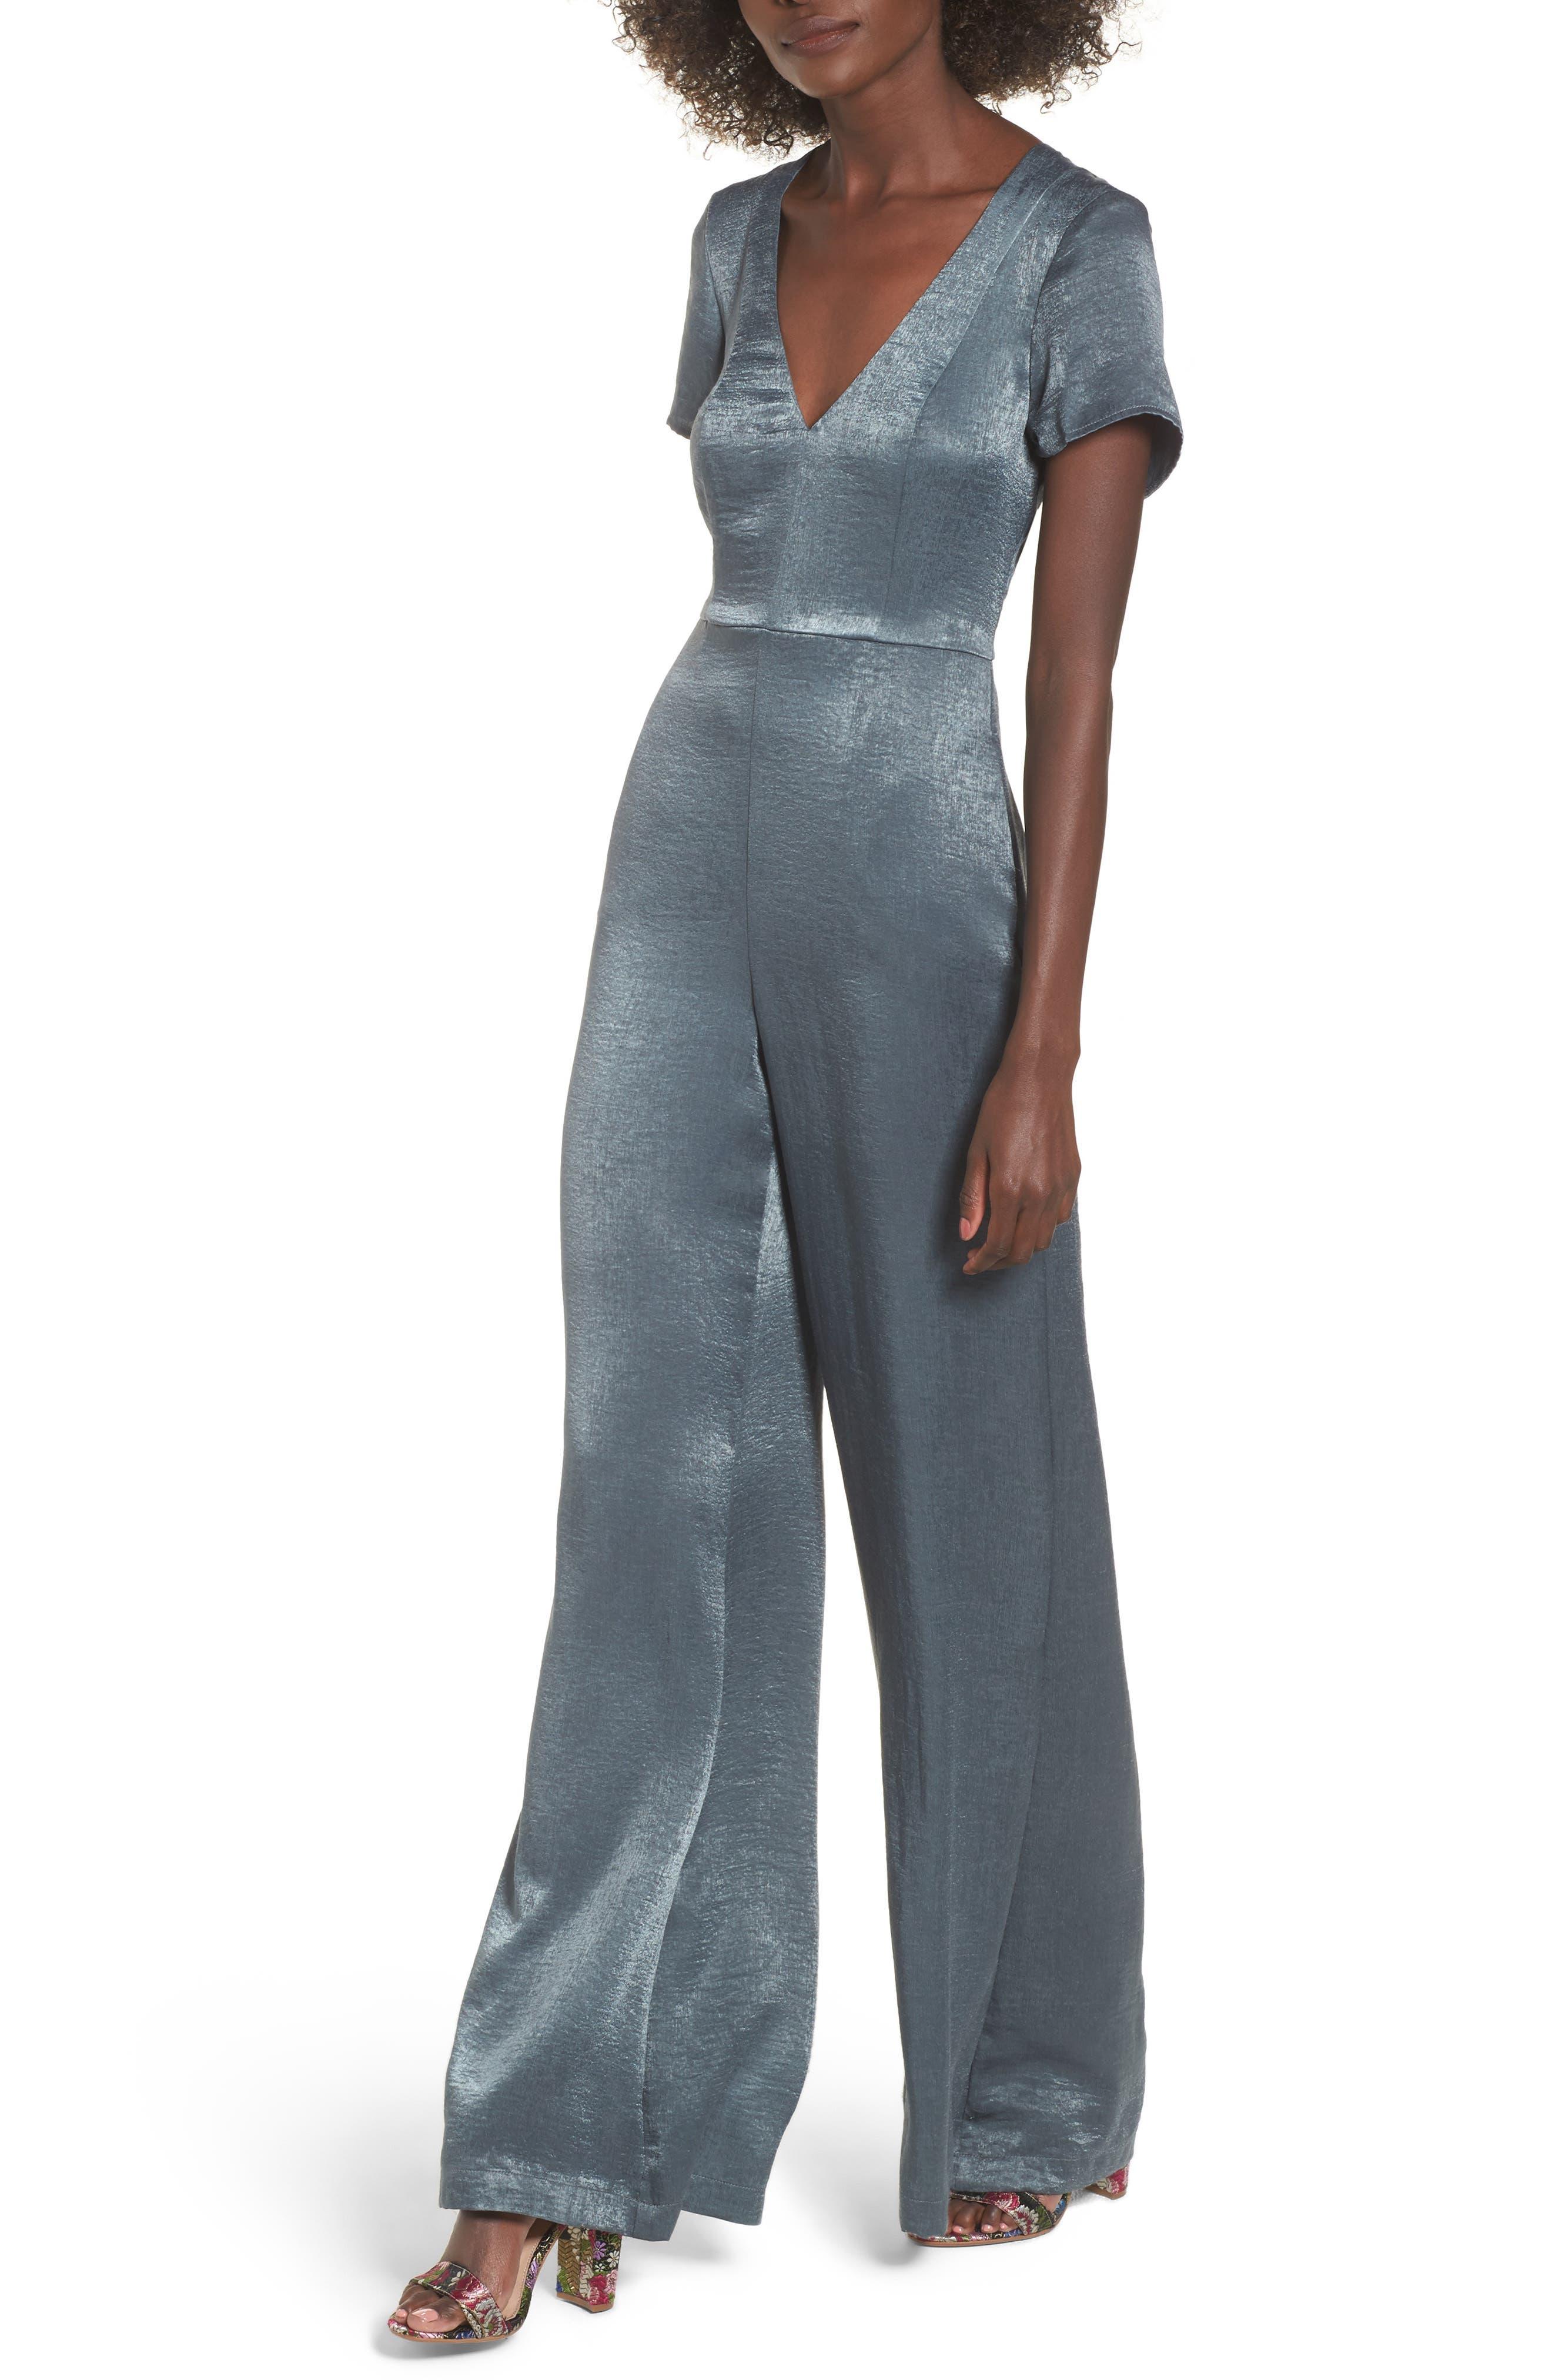 Alternate Image 1 Selected - Show Me Your Mumu Brianna Jumpsuit